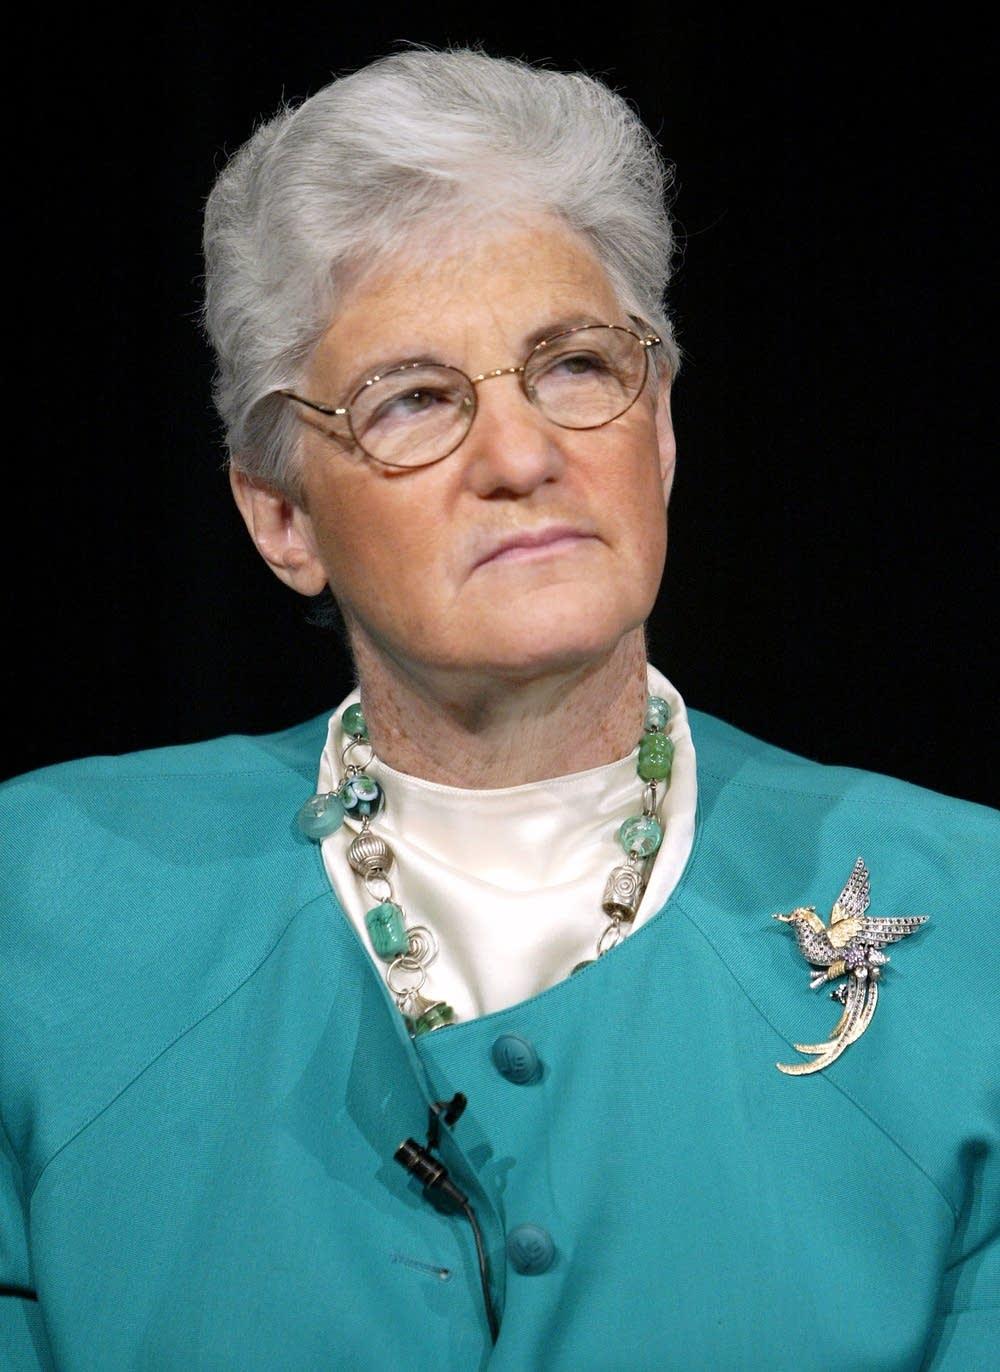 Former Philadelphia D.A. Lynne Abraham